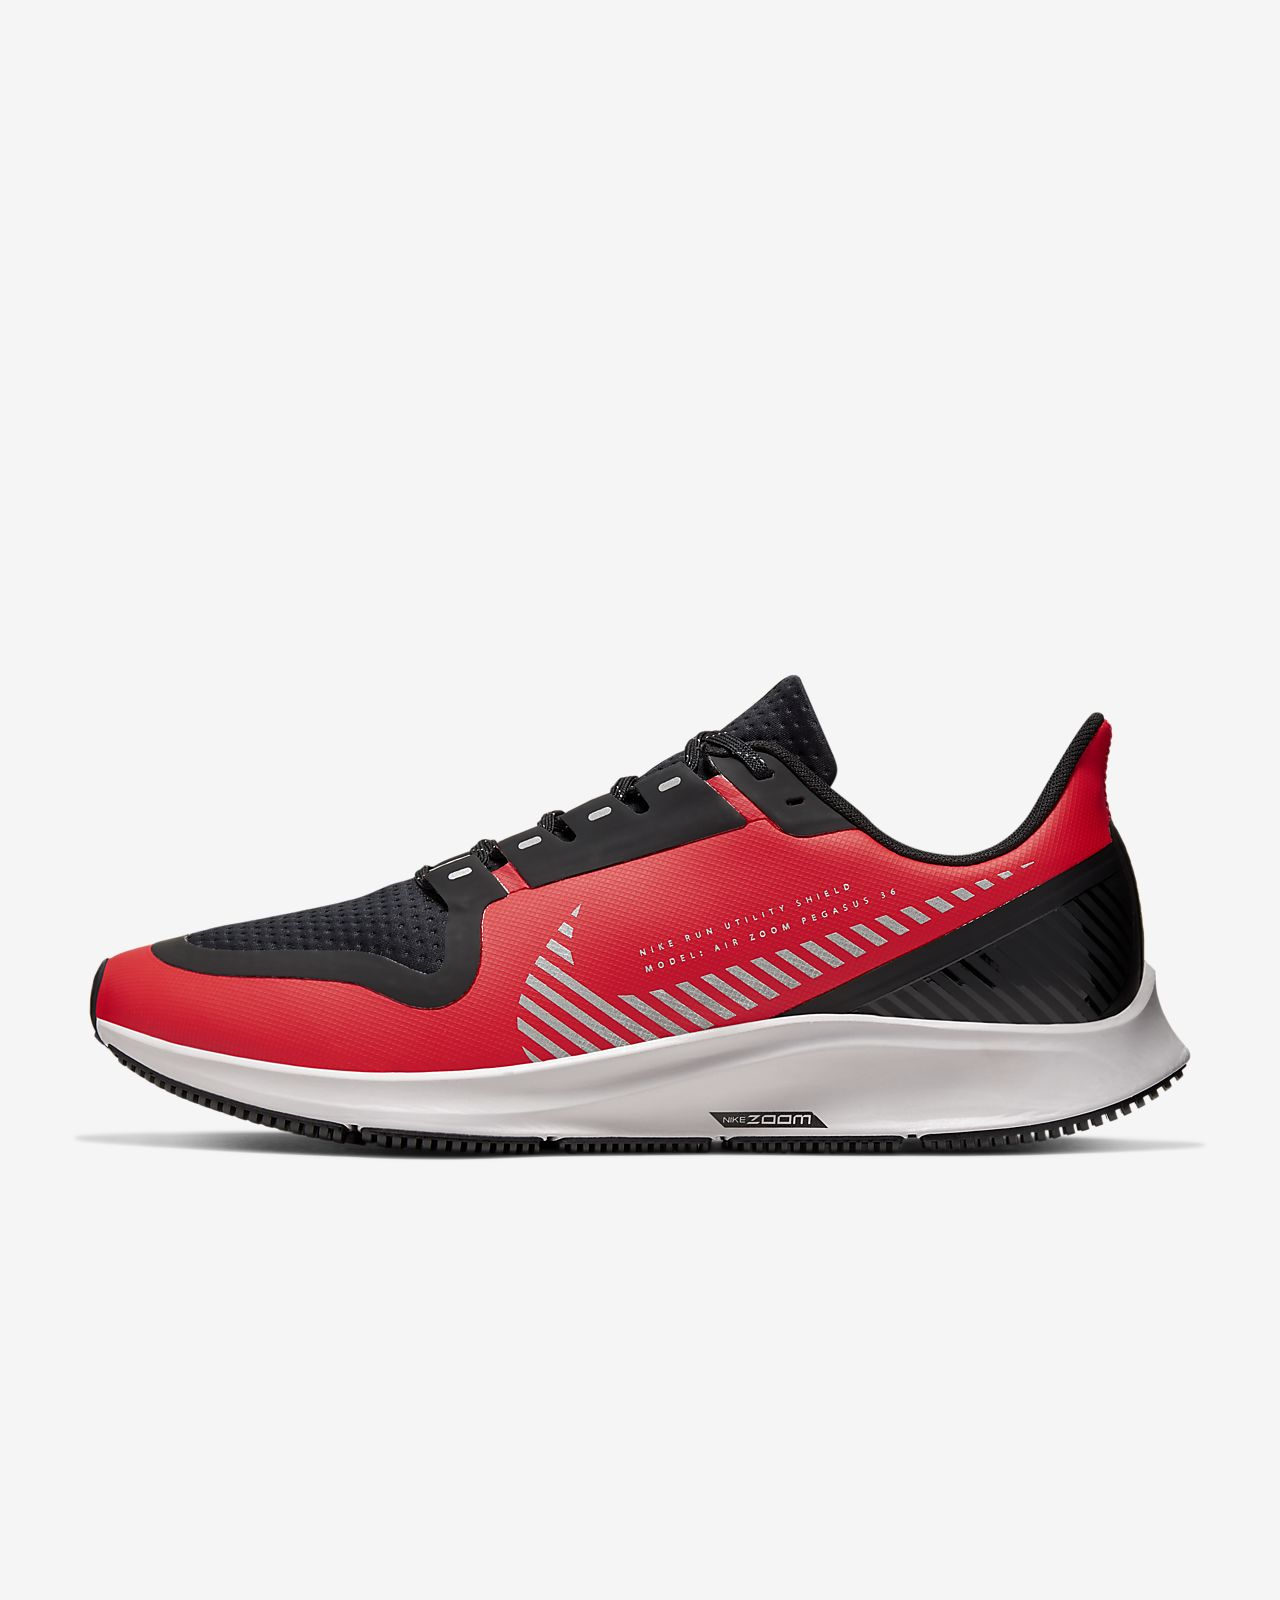 shoes, nike running shoes, nike air, nike sneakers, nike